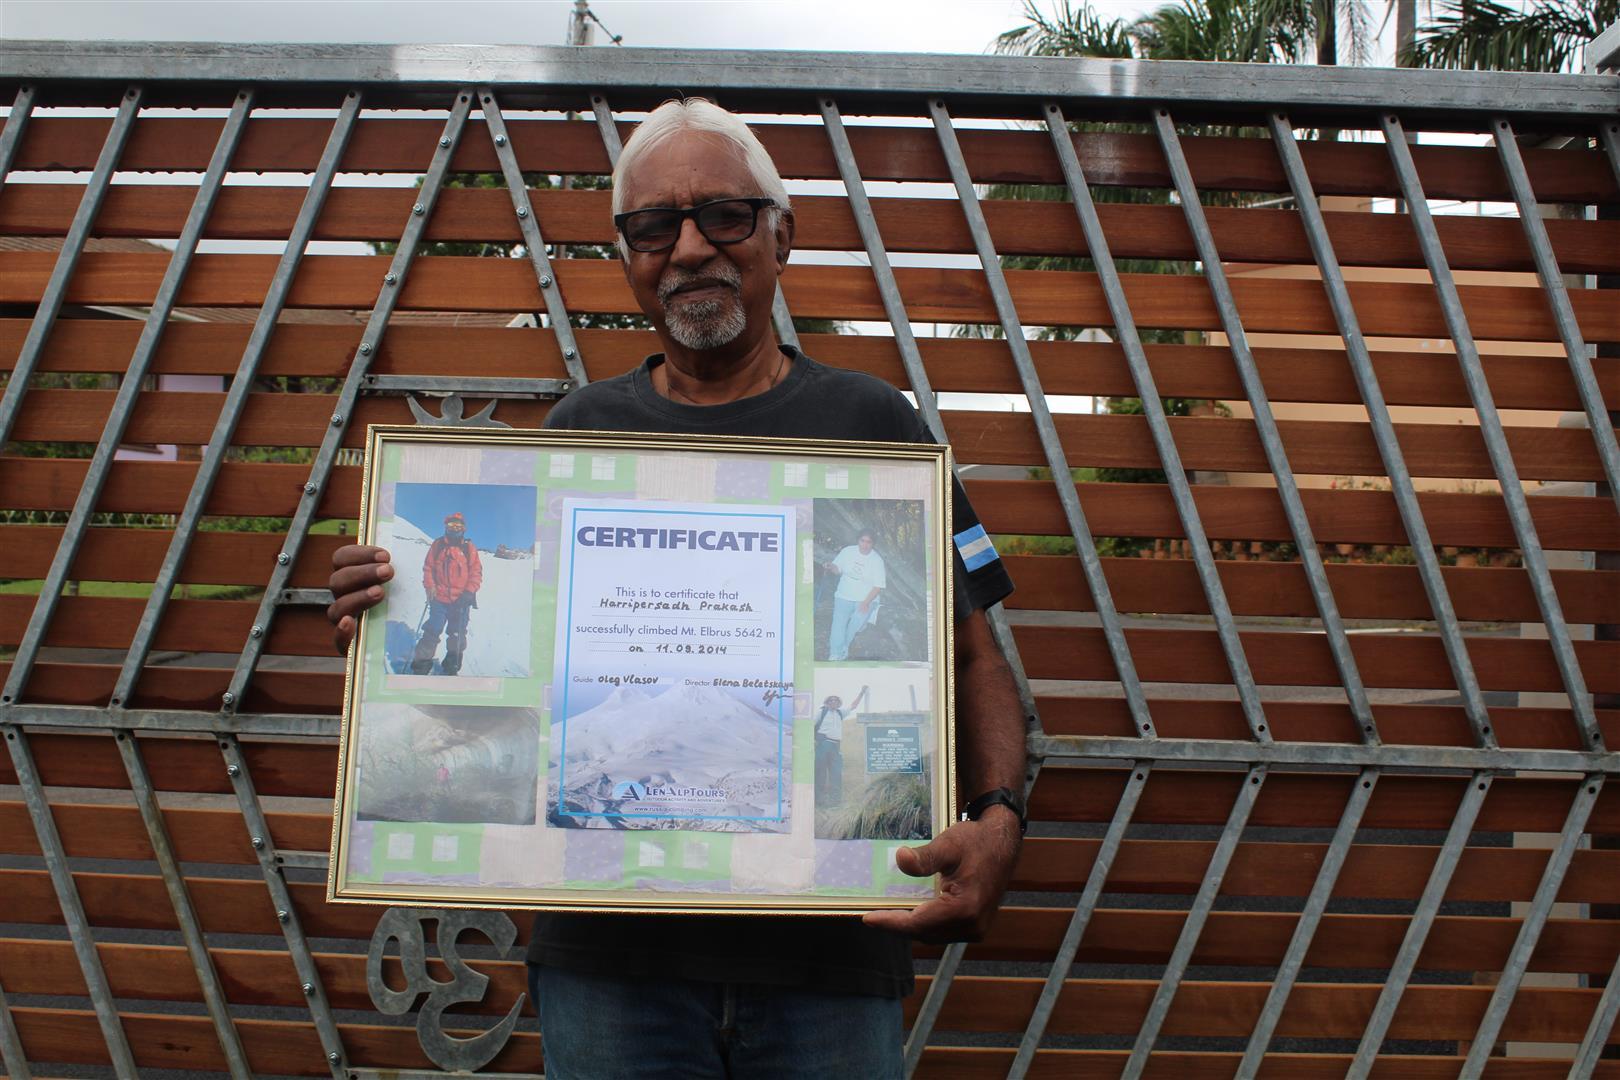 73 year old Prakash Harripersadh, has summited seven international mountains including Mount Kilamajaro.